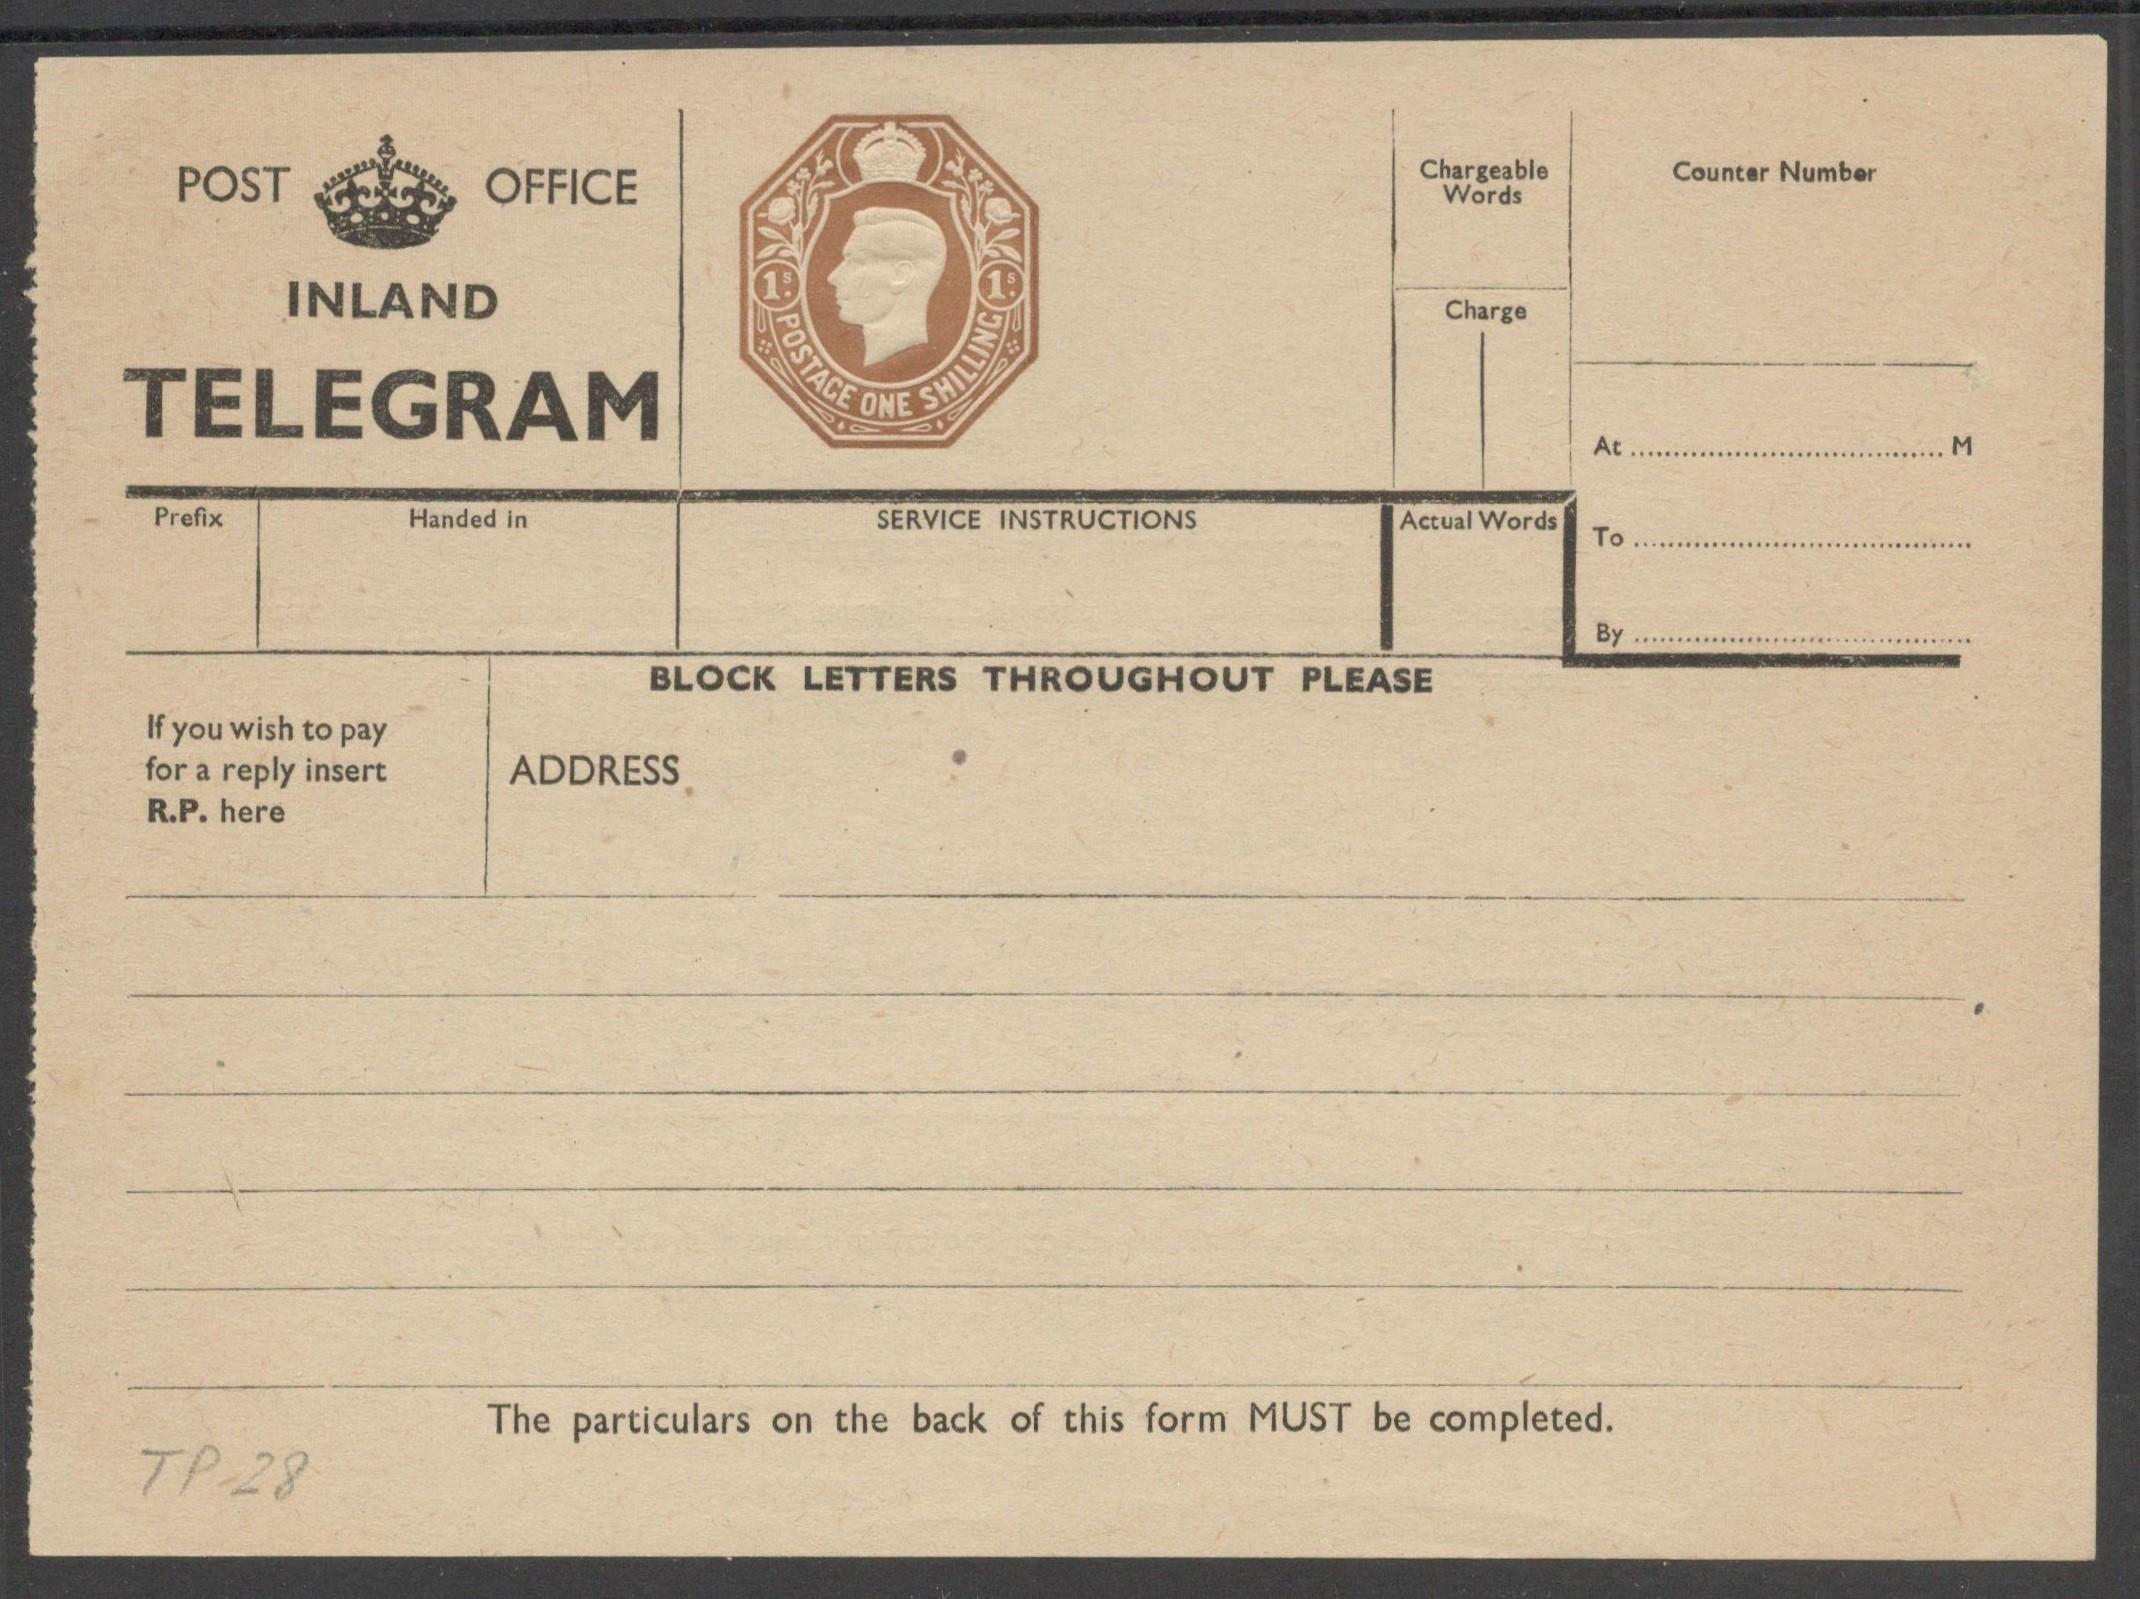 POST OFFICE INLAND TELEGRAM 1940 KGVI TELEGRAPH FORM 1 SHILLING TP28